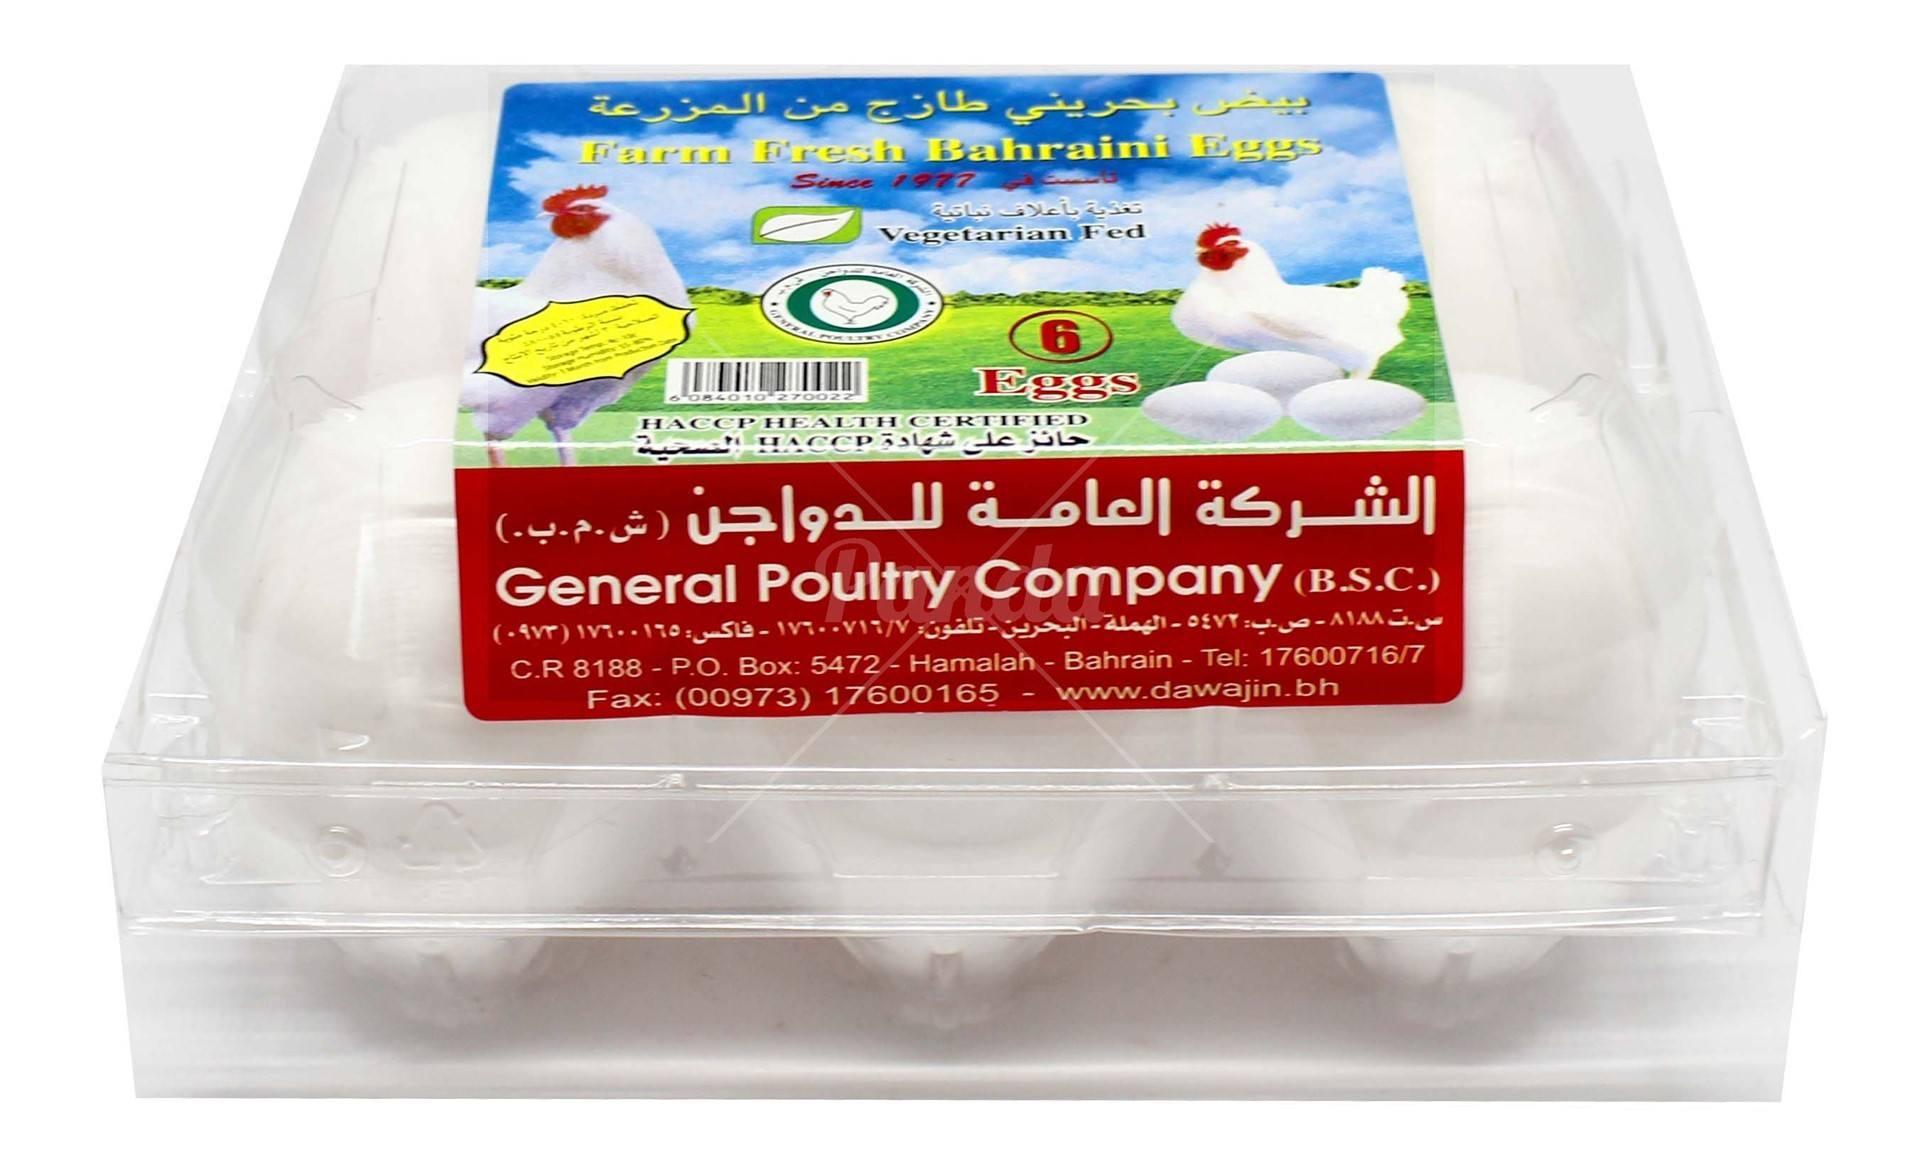 FARM FRESH BAHRAINI EGGS  6PCS